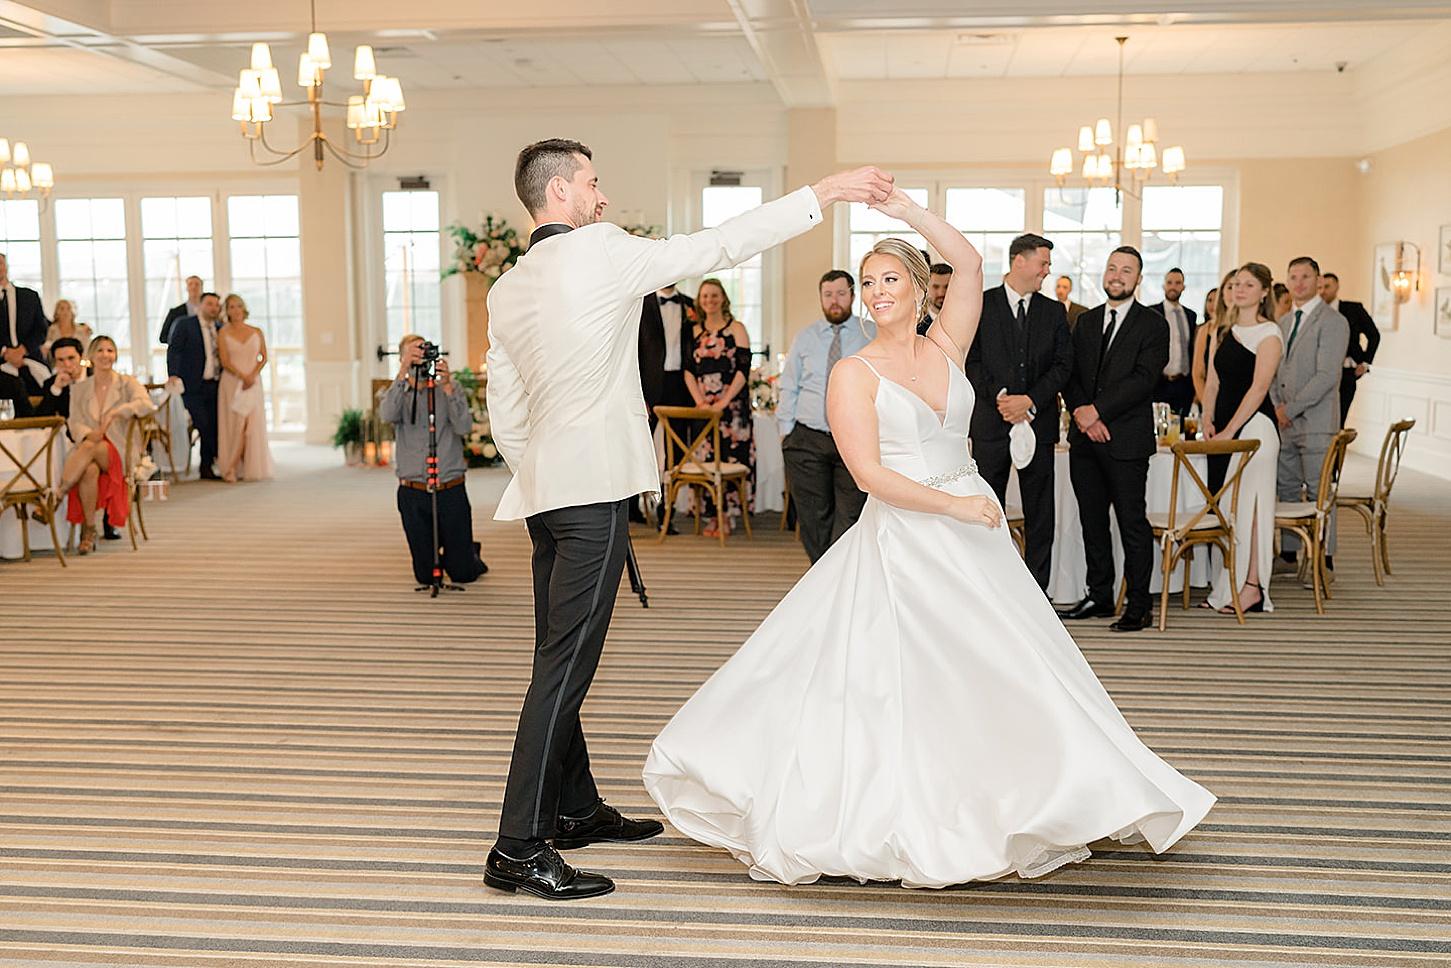 Linwood Country Club Summer Wedding Photography Studio by Magdalena Studios Jenn Kyle 0057